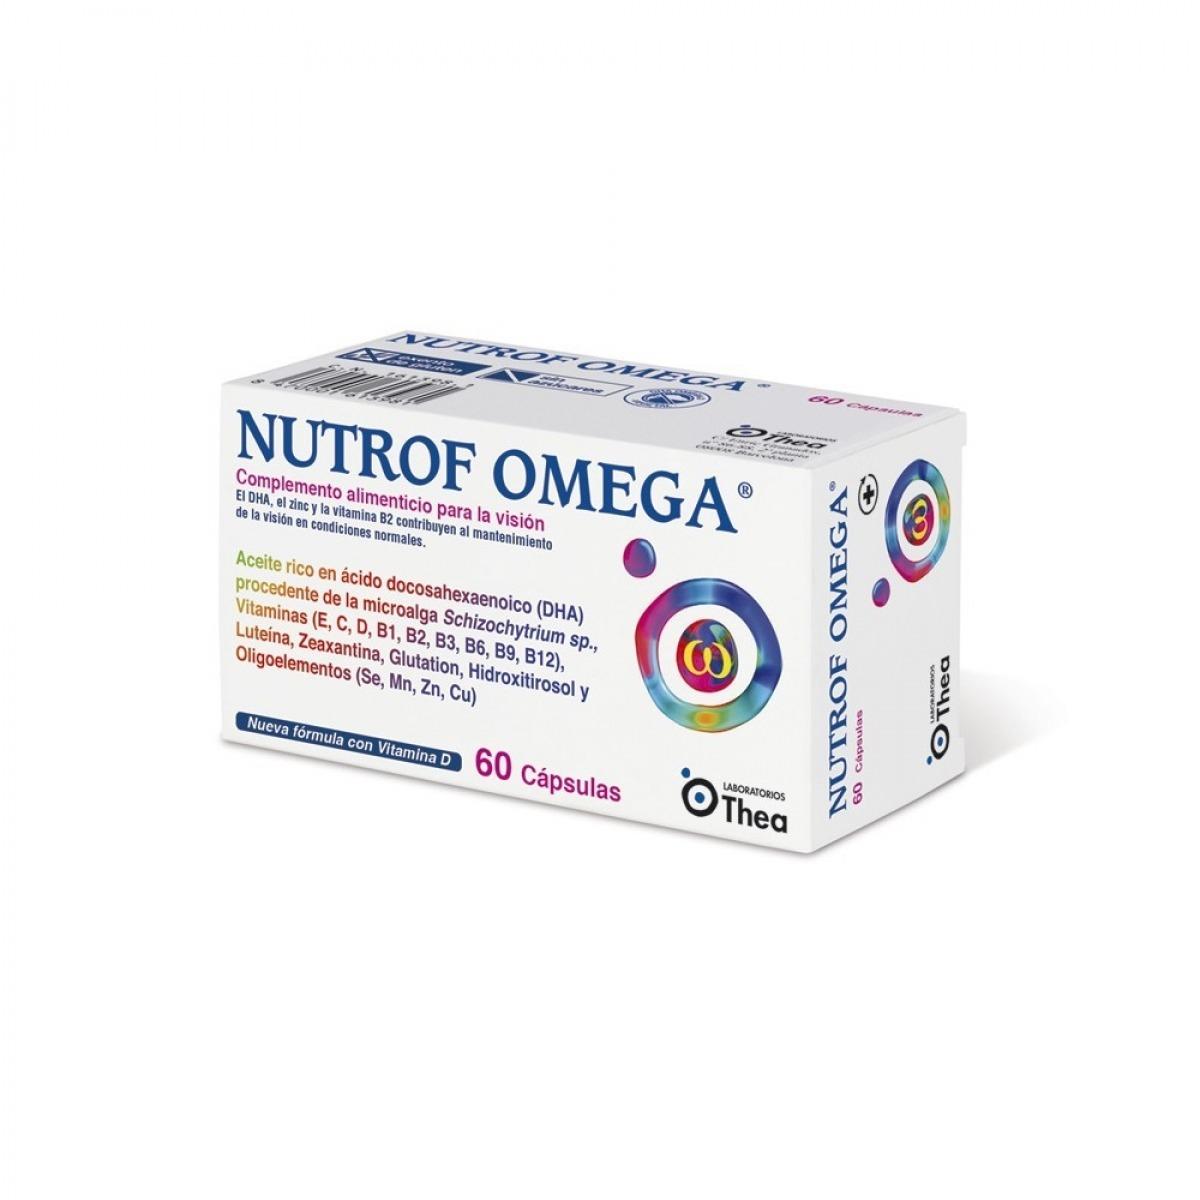 NUTROFOMEGACAPS60CAPS I1